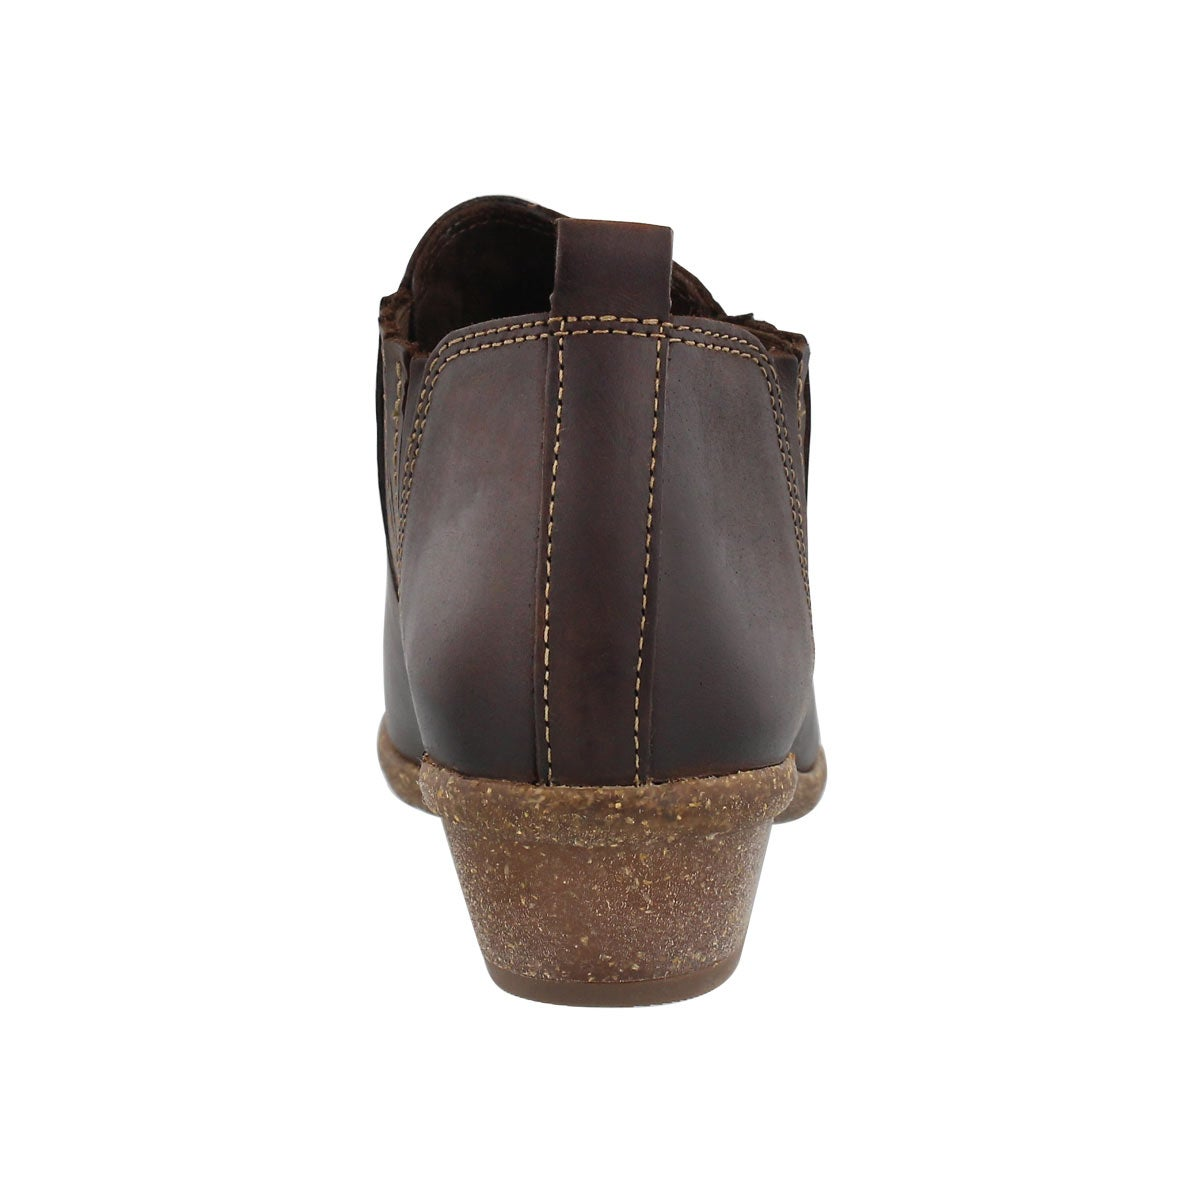 Lds Wilrose Jade brn slip on casual boot